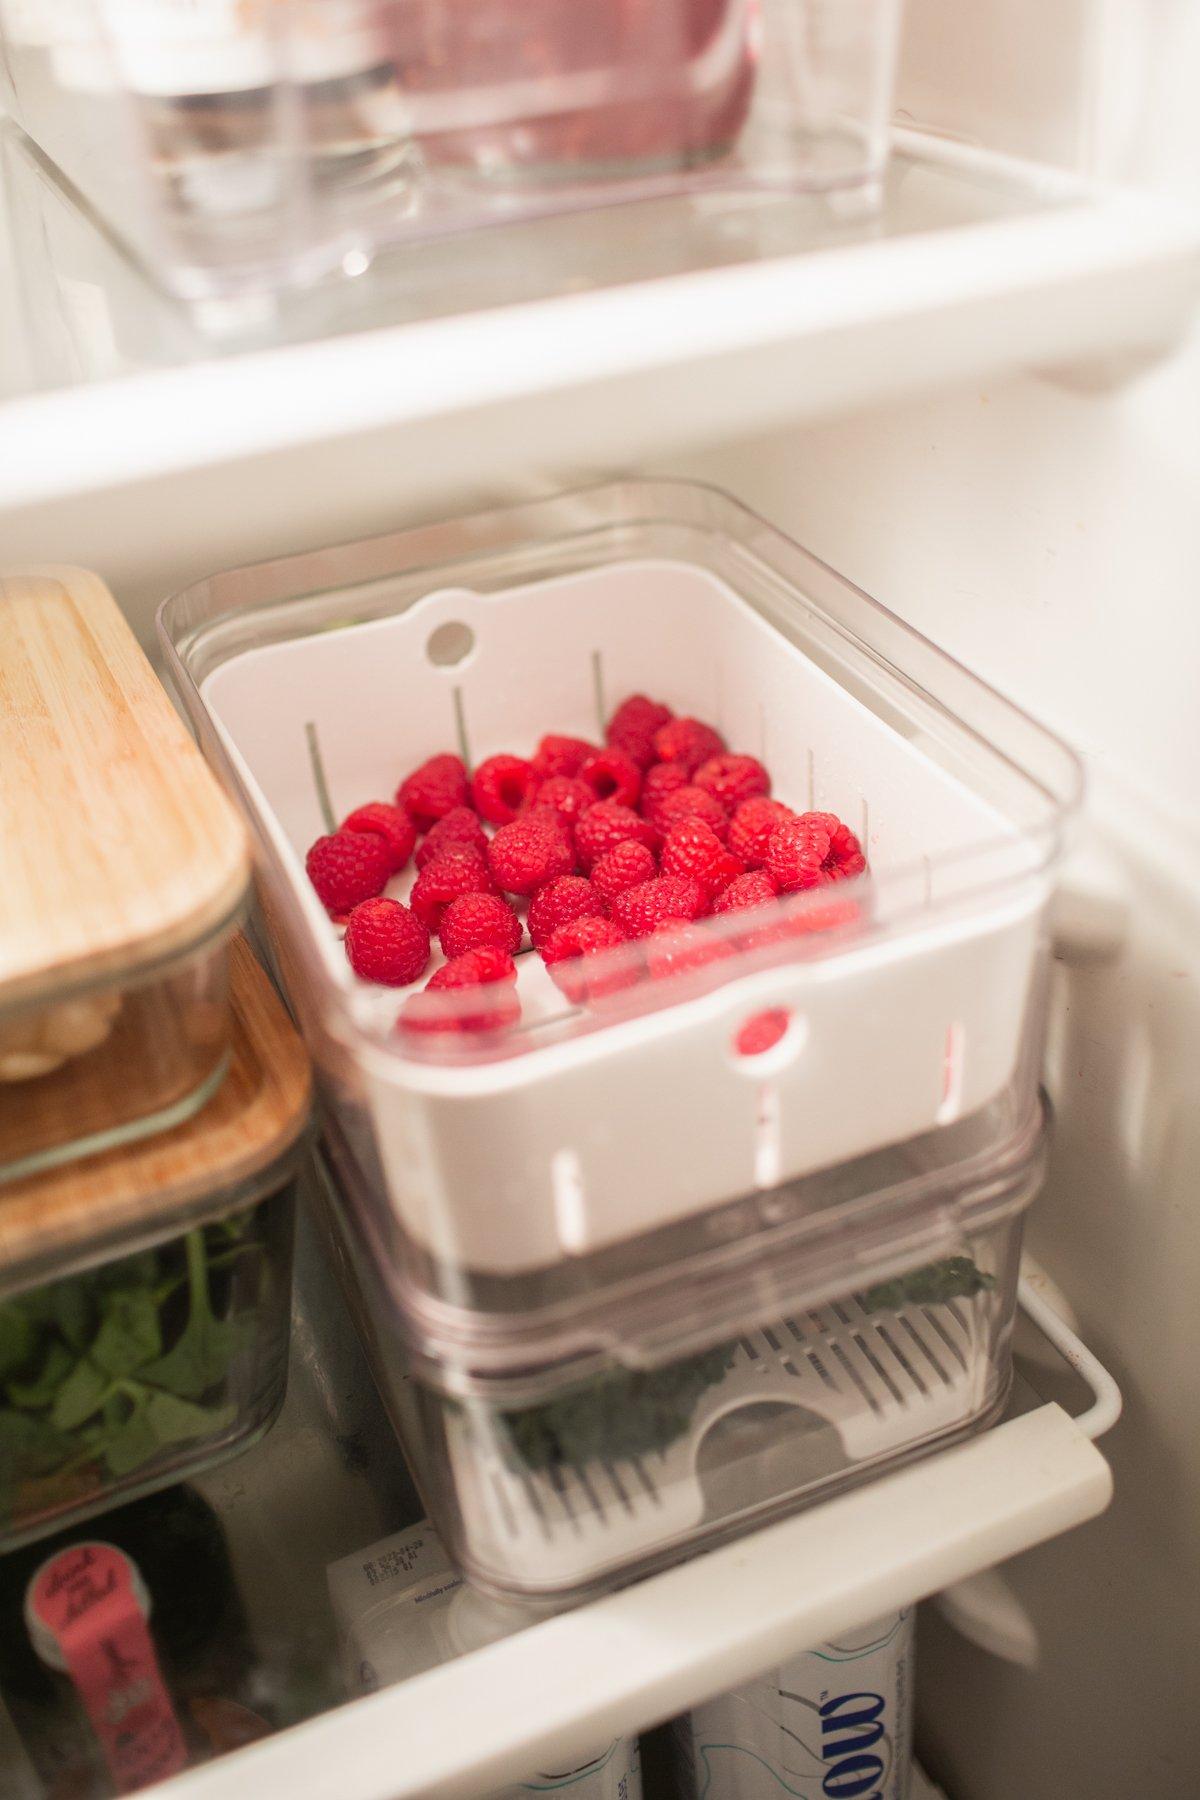 refrigerator berry container